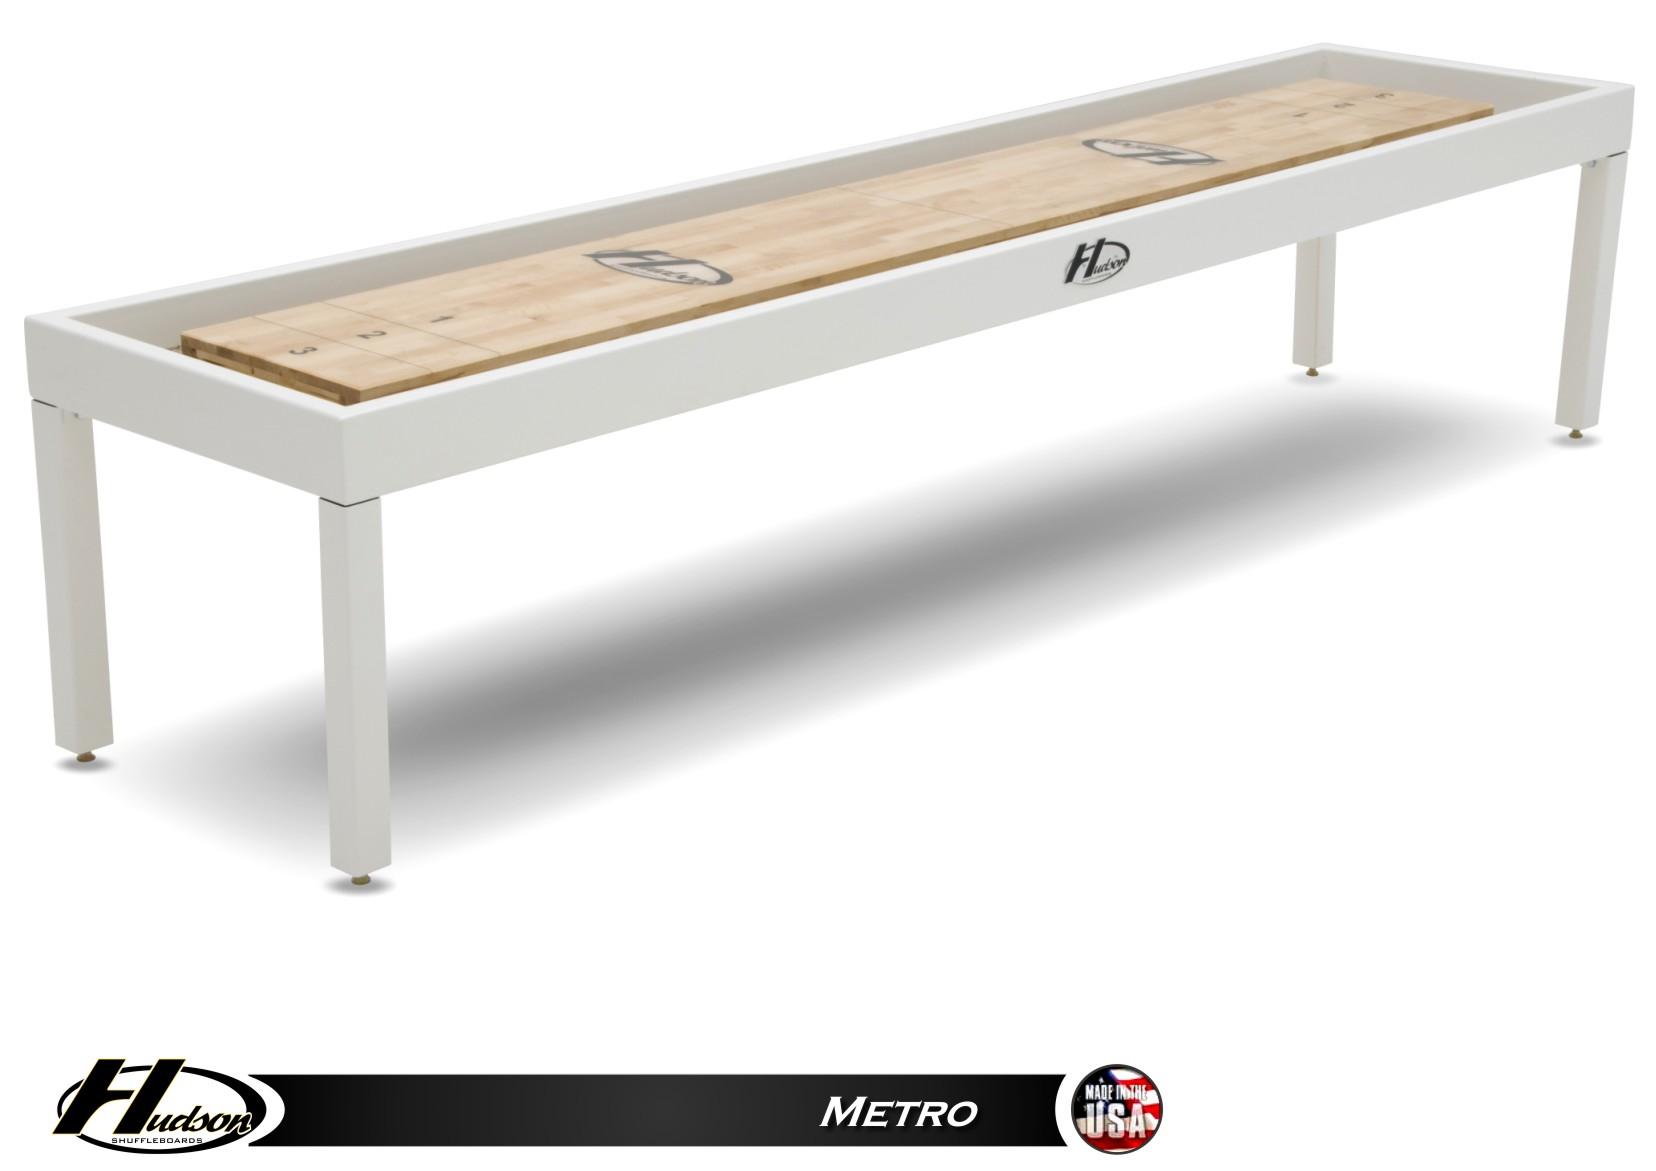 Metro Custom Options